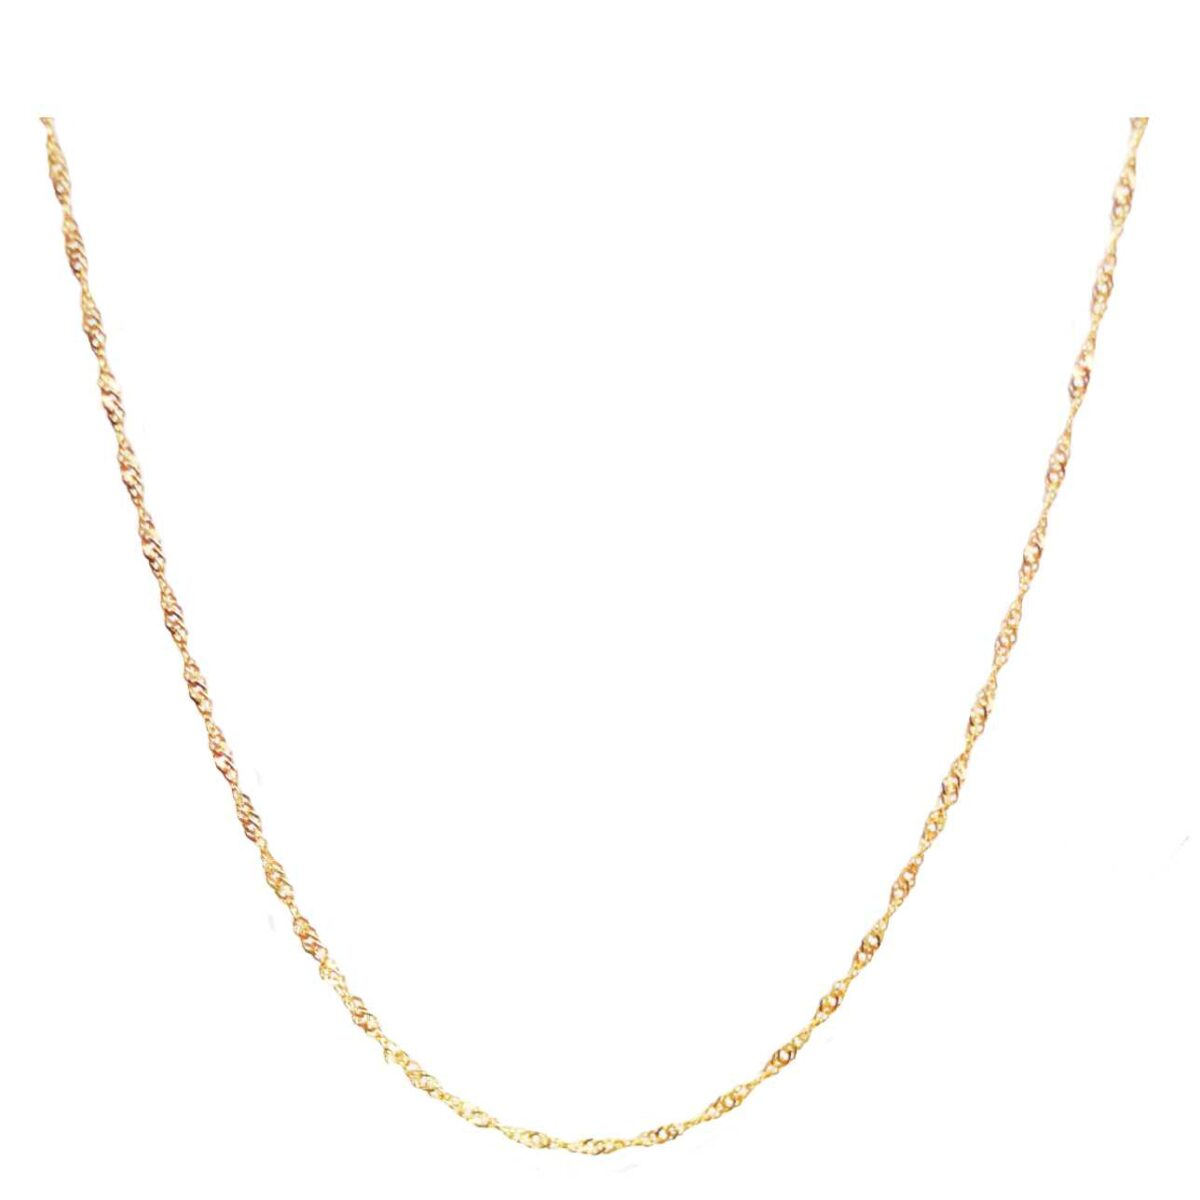 Twist me chain II gold plated